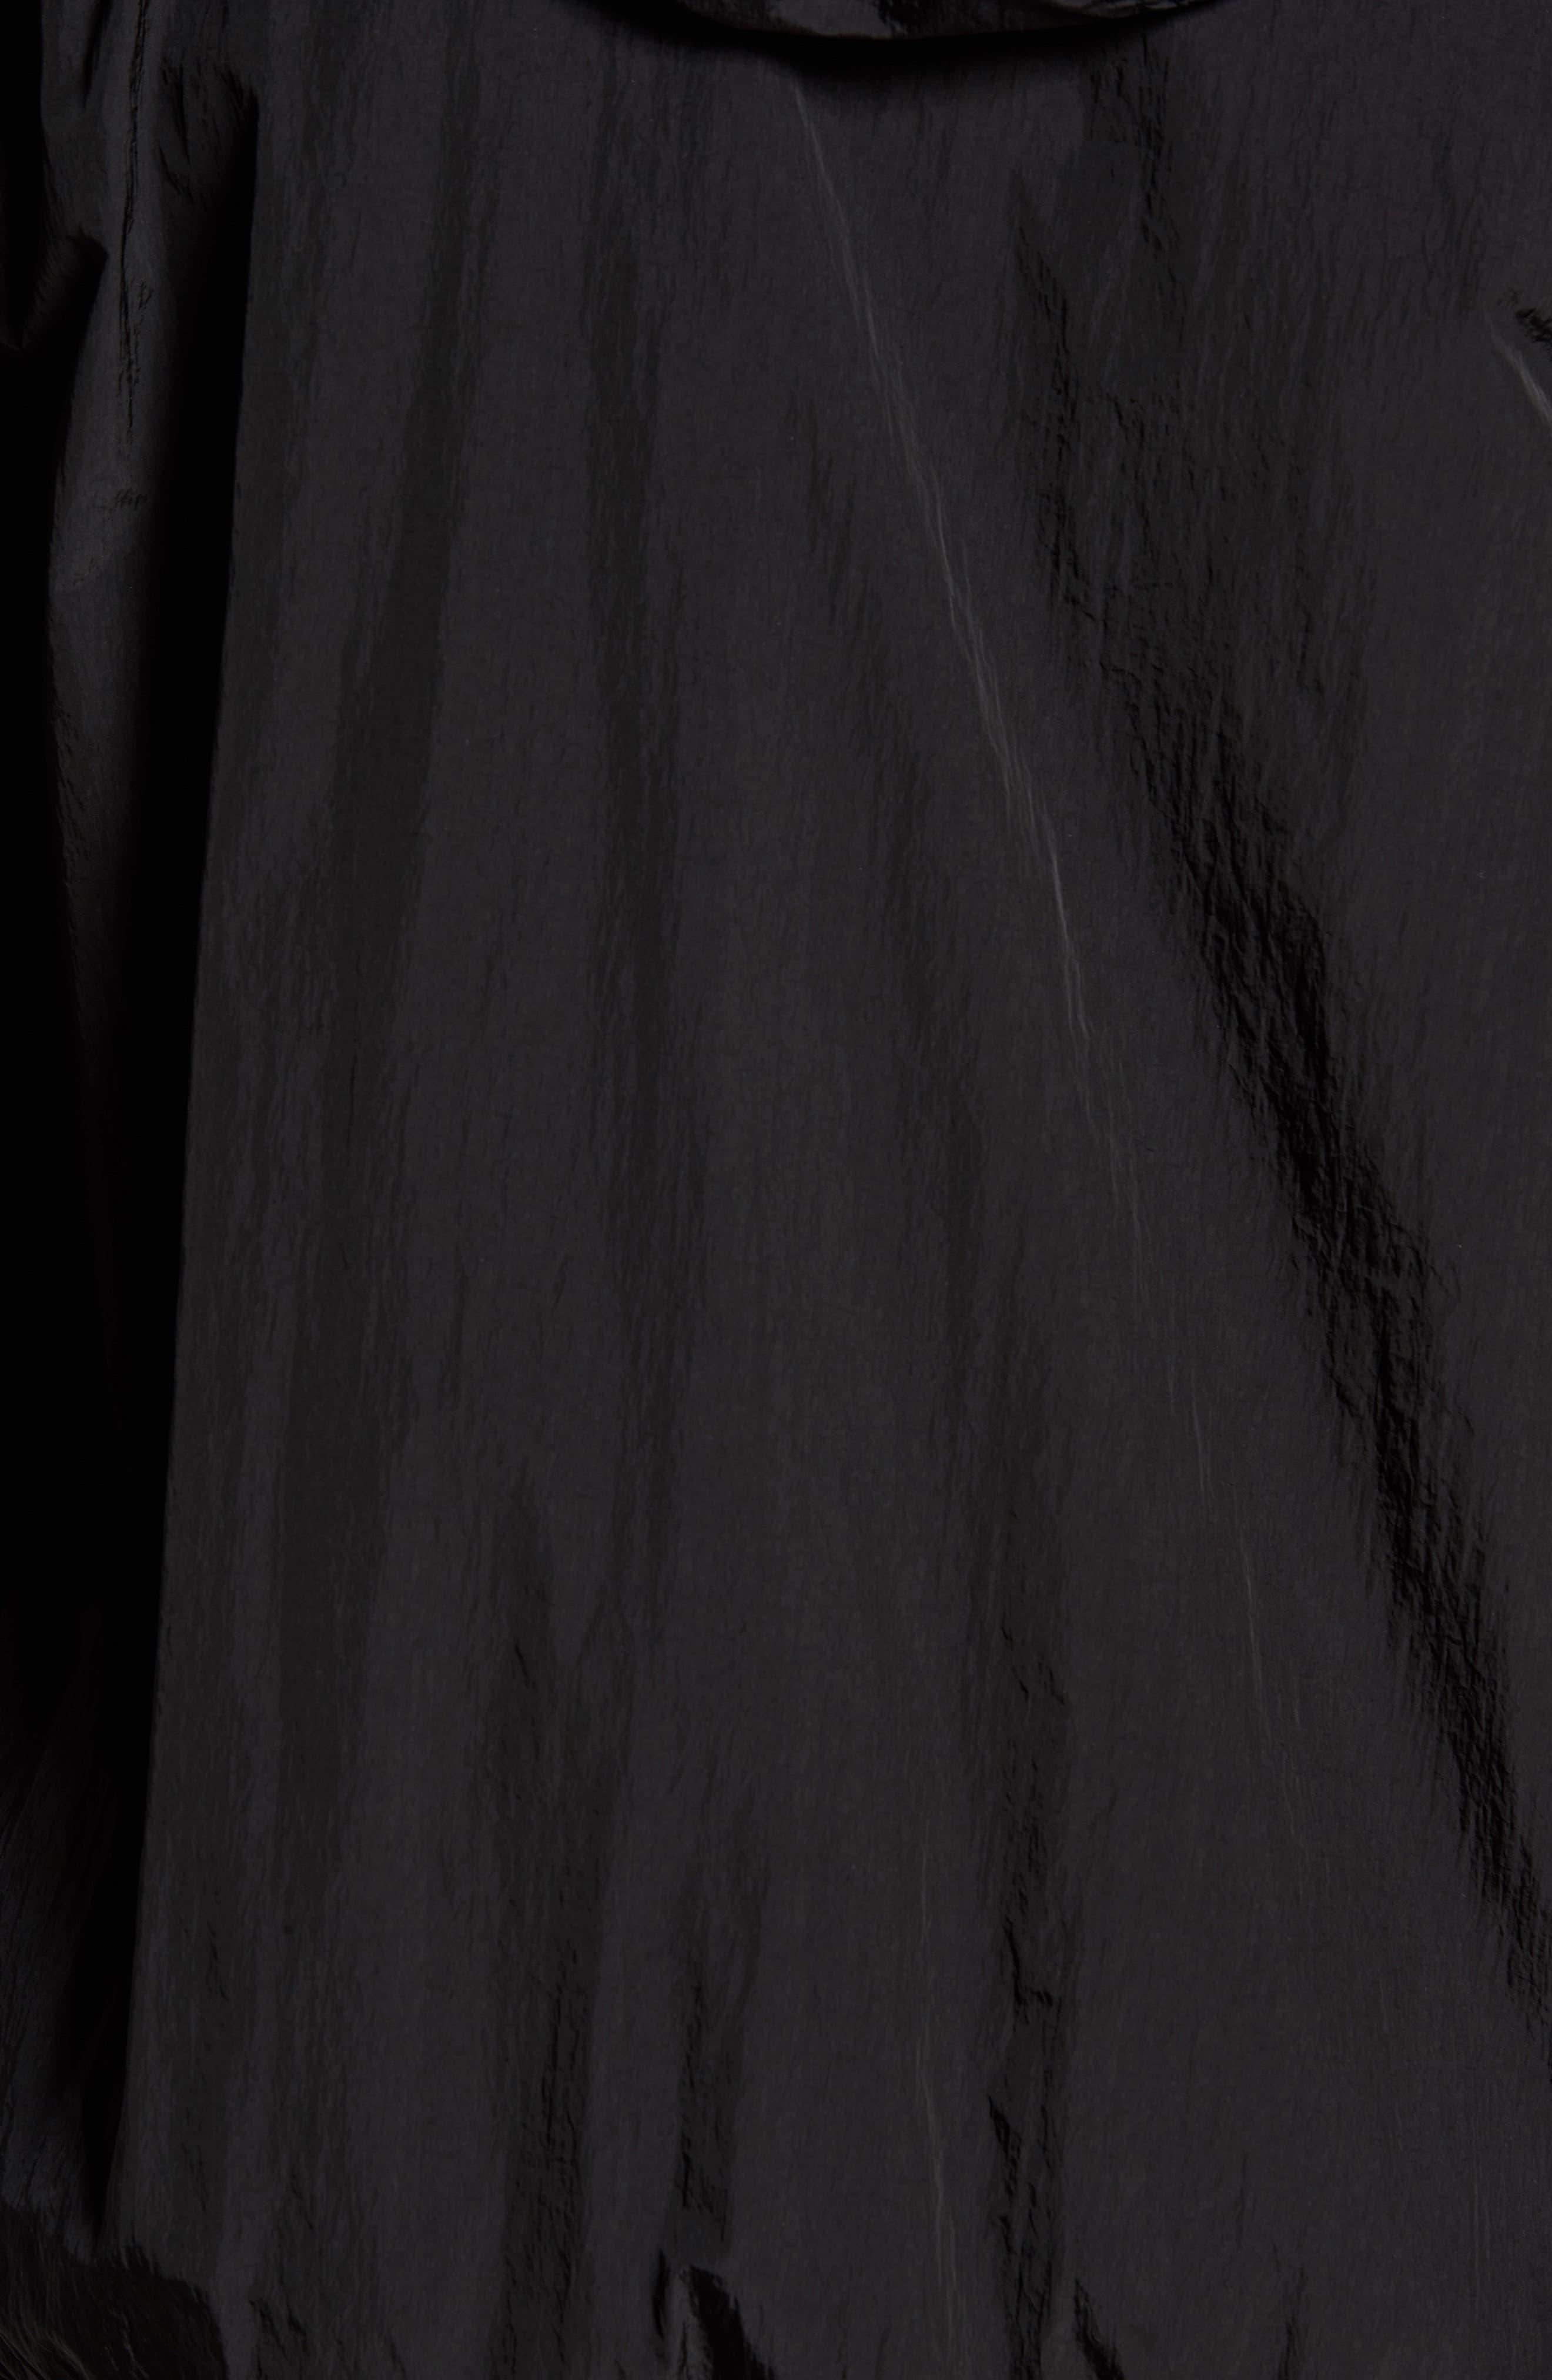 Hooded Shell Jacket,                             Alternate thumbnail 5, color,                             Black/ Deep Forest